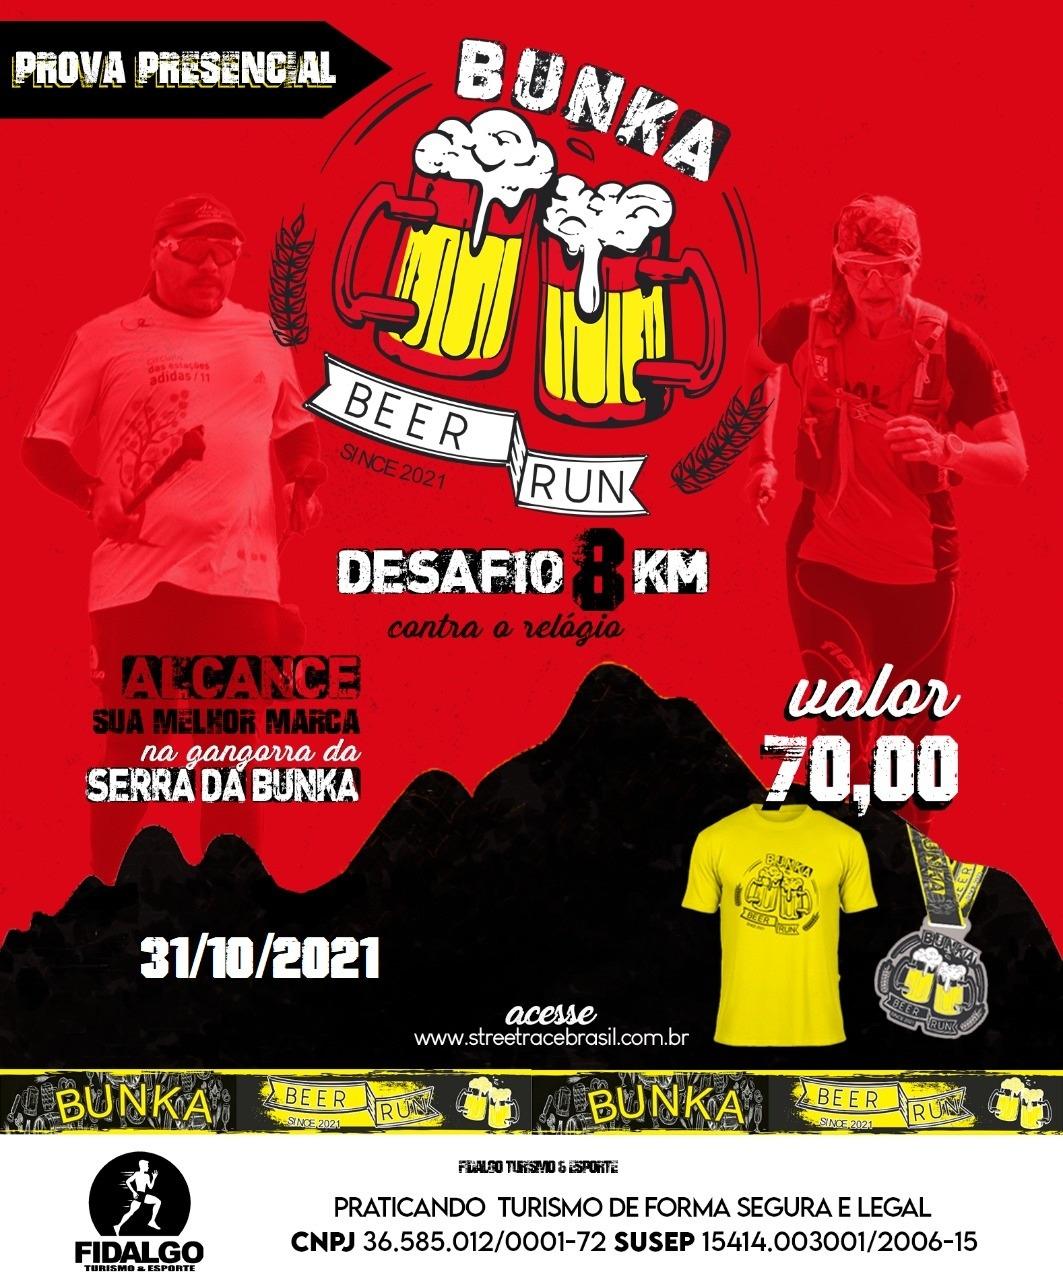 DESAFIO BUNKA BEER RUN 8K- BATERIA 5